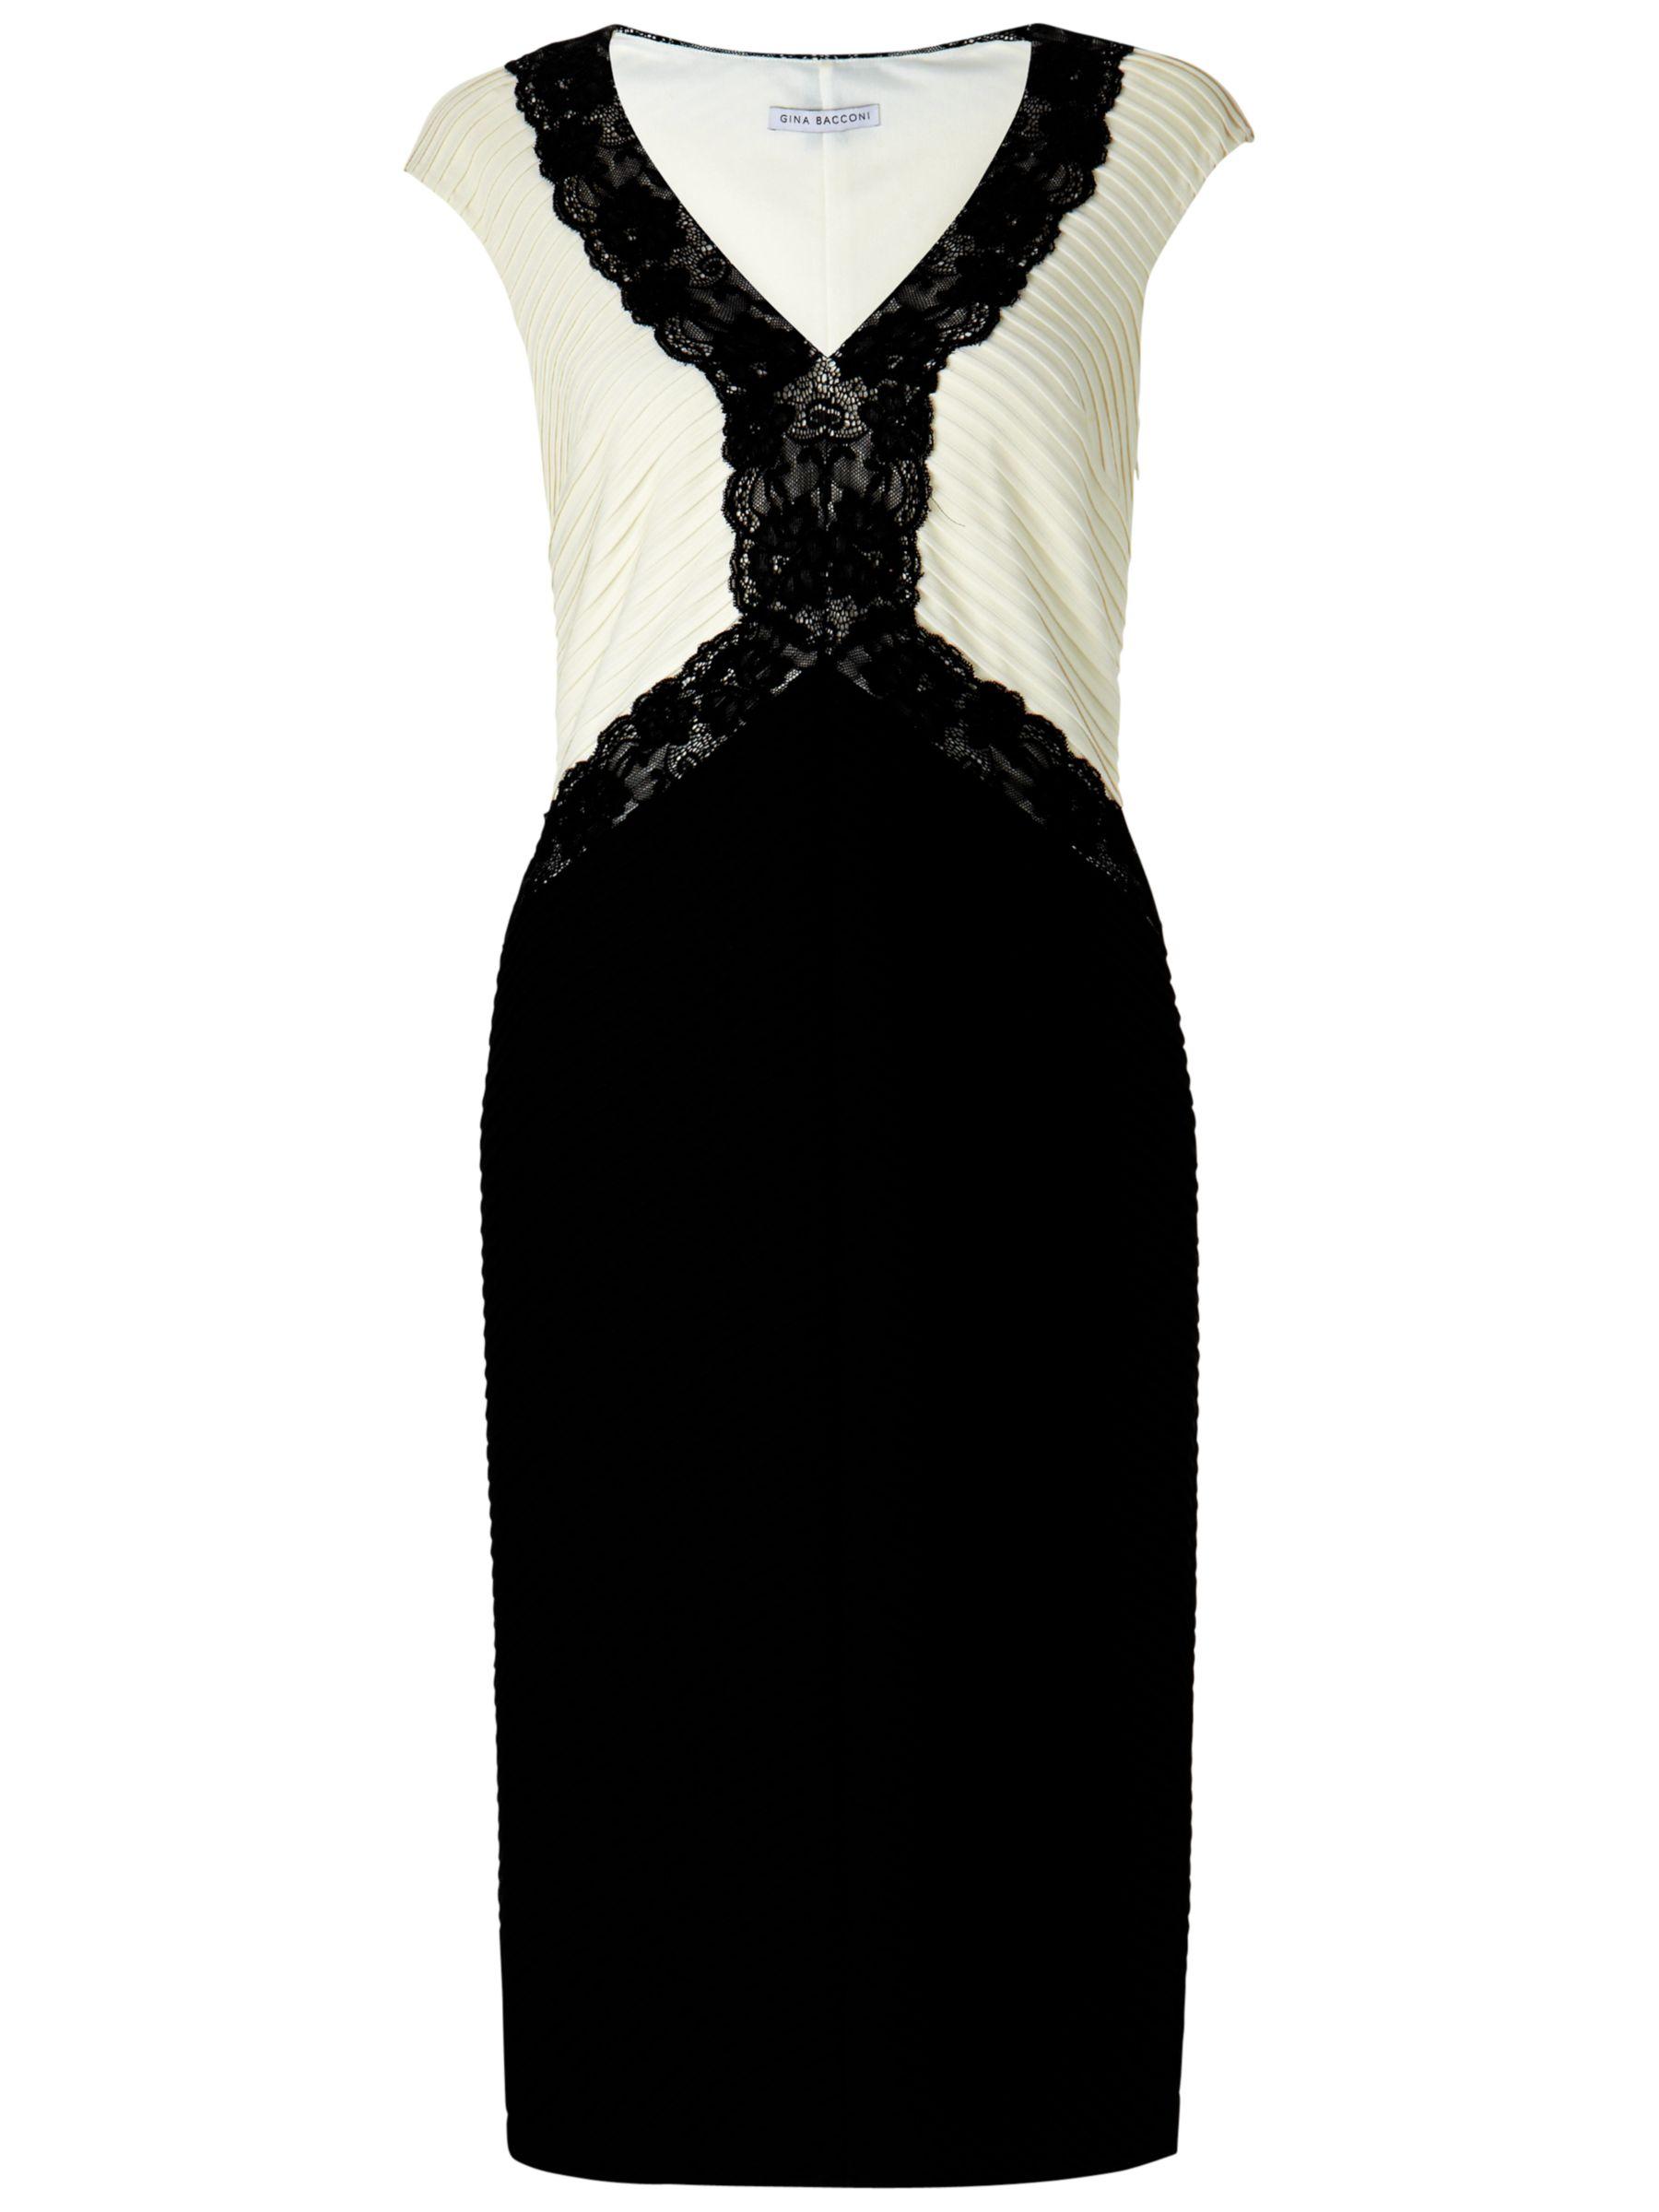 Gina Bacconi Lace Bodice Dress, Black/Chalk Light